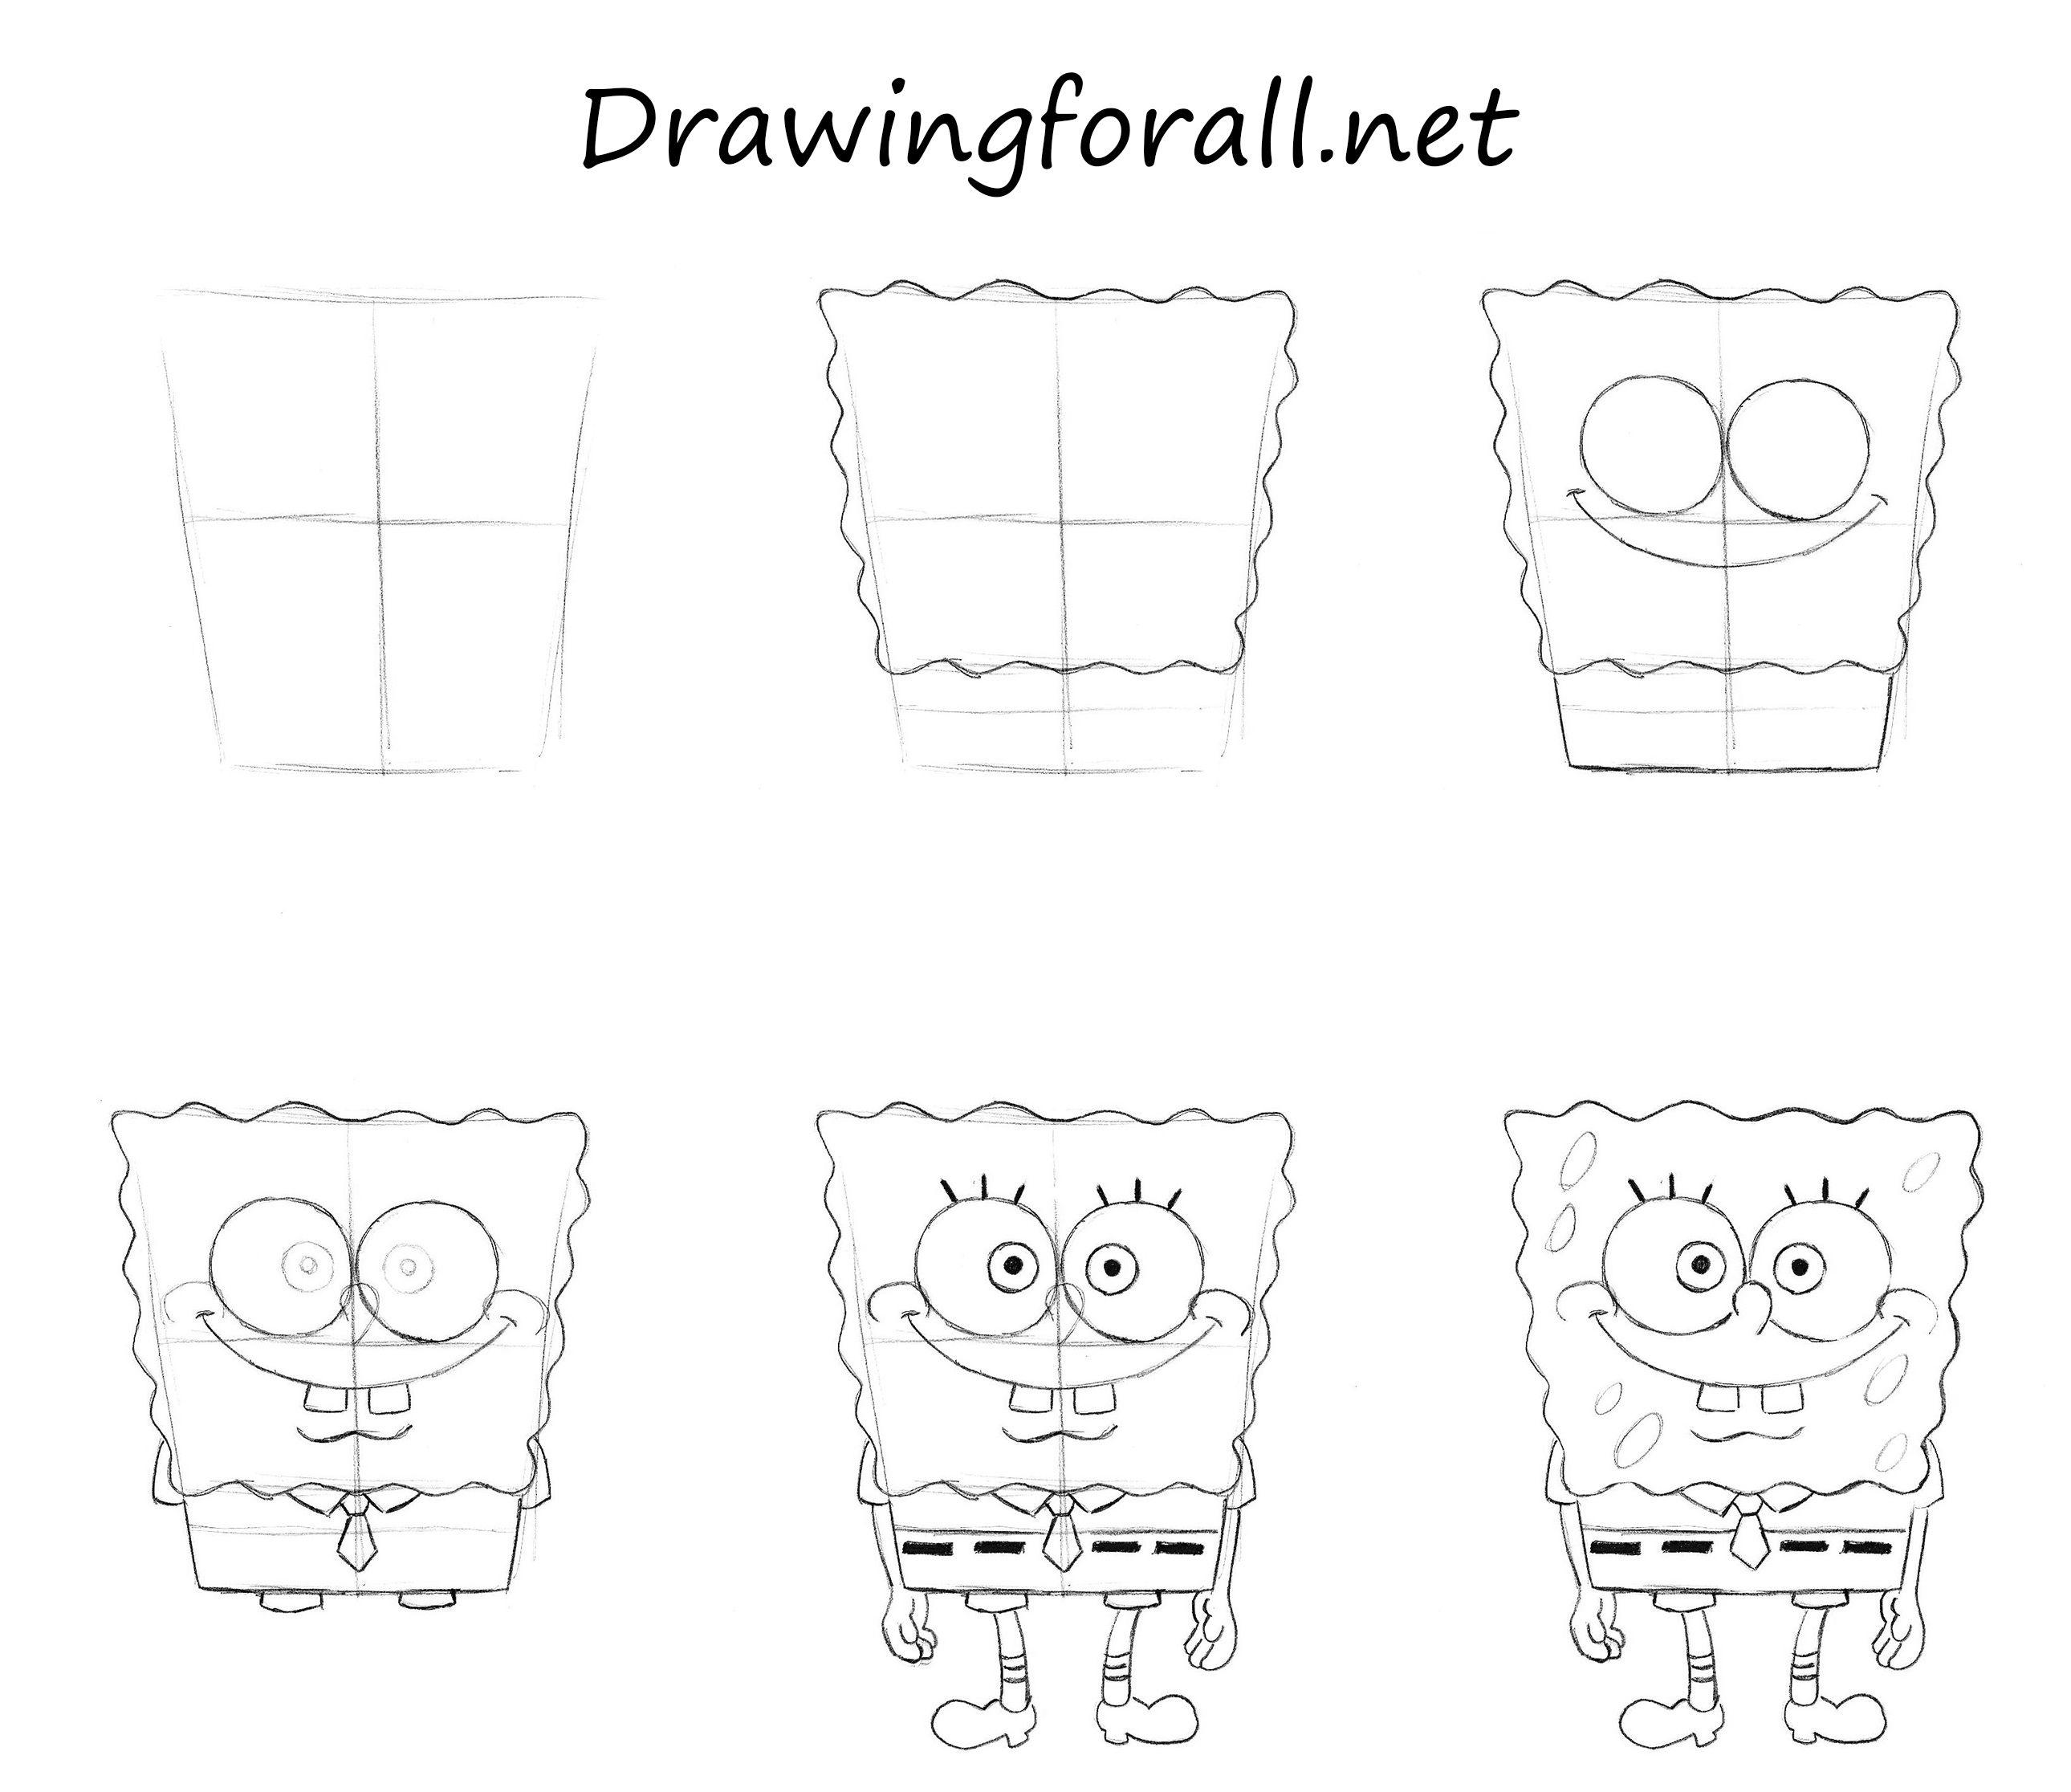 How To Draw Spongebob How To Draw Spongebob Squarepants Spongebob Squarepants Drawings Spongebob Drawings Spongebob Painting Cartoon Drawings